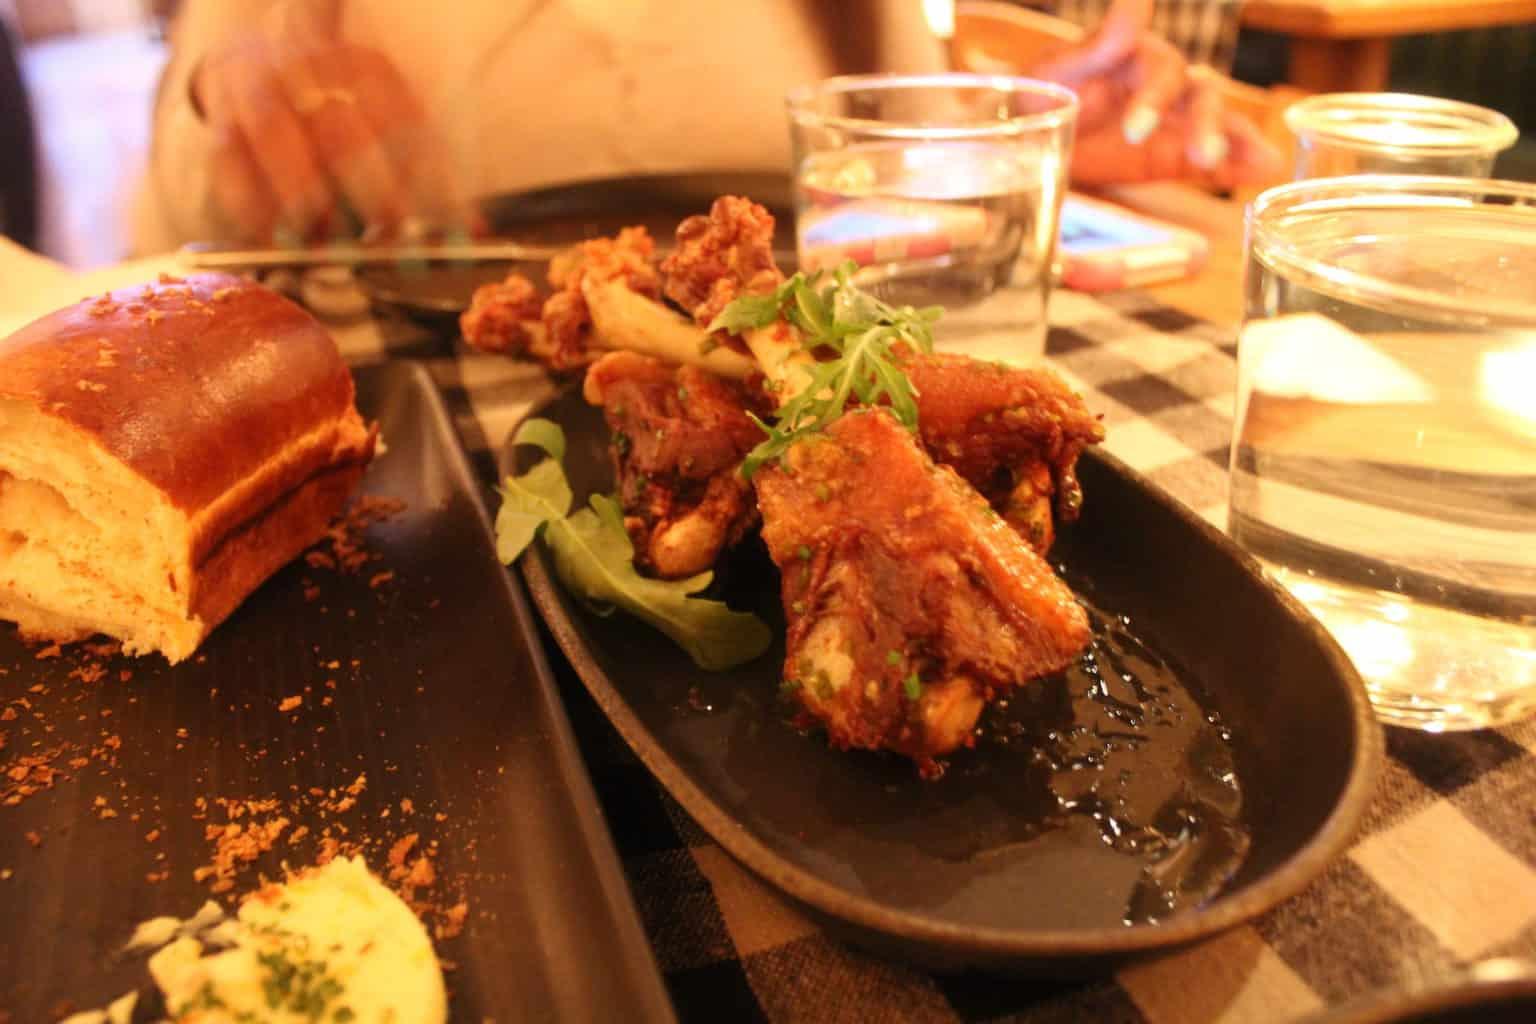 Crispy duck wings lemon, olive oil + yuzu kosho